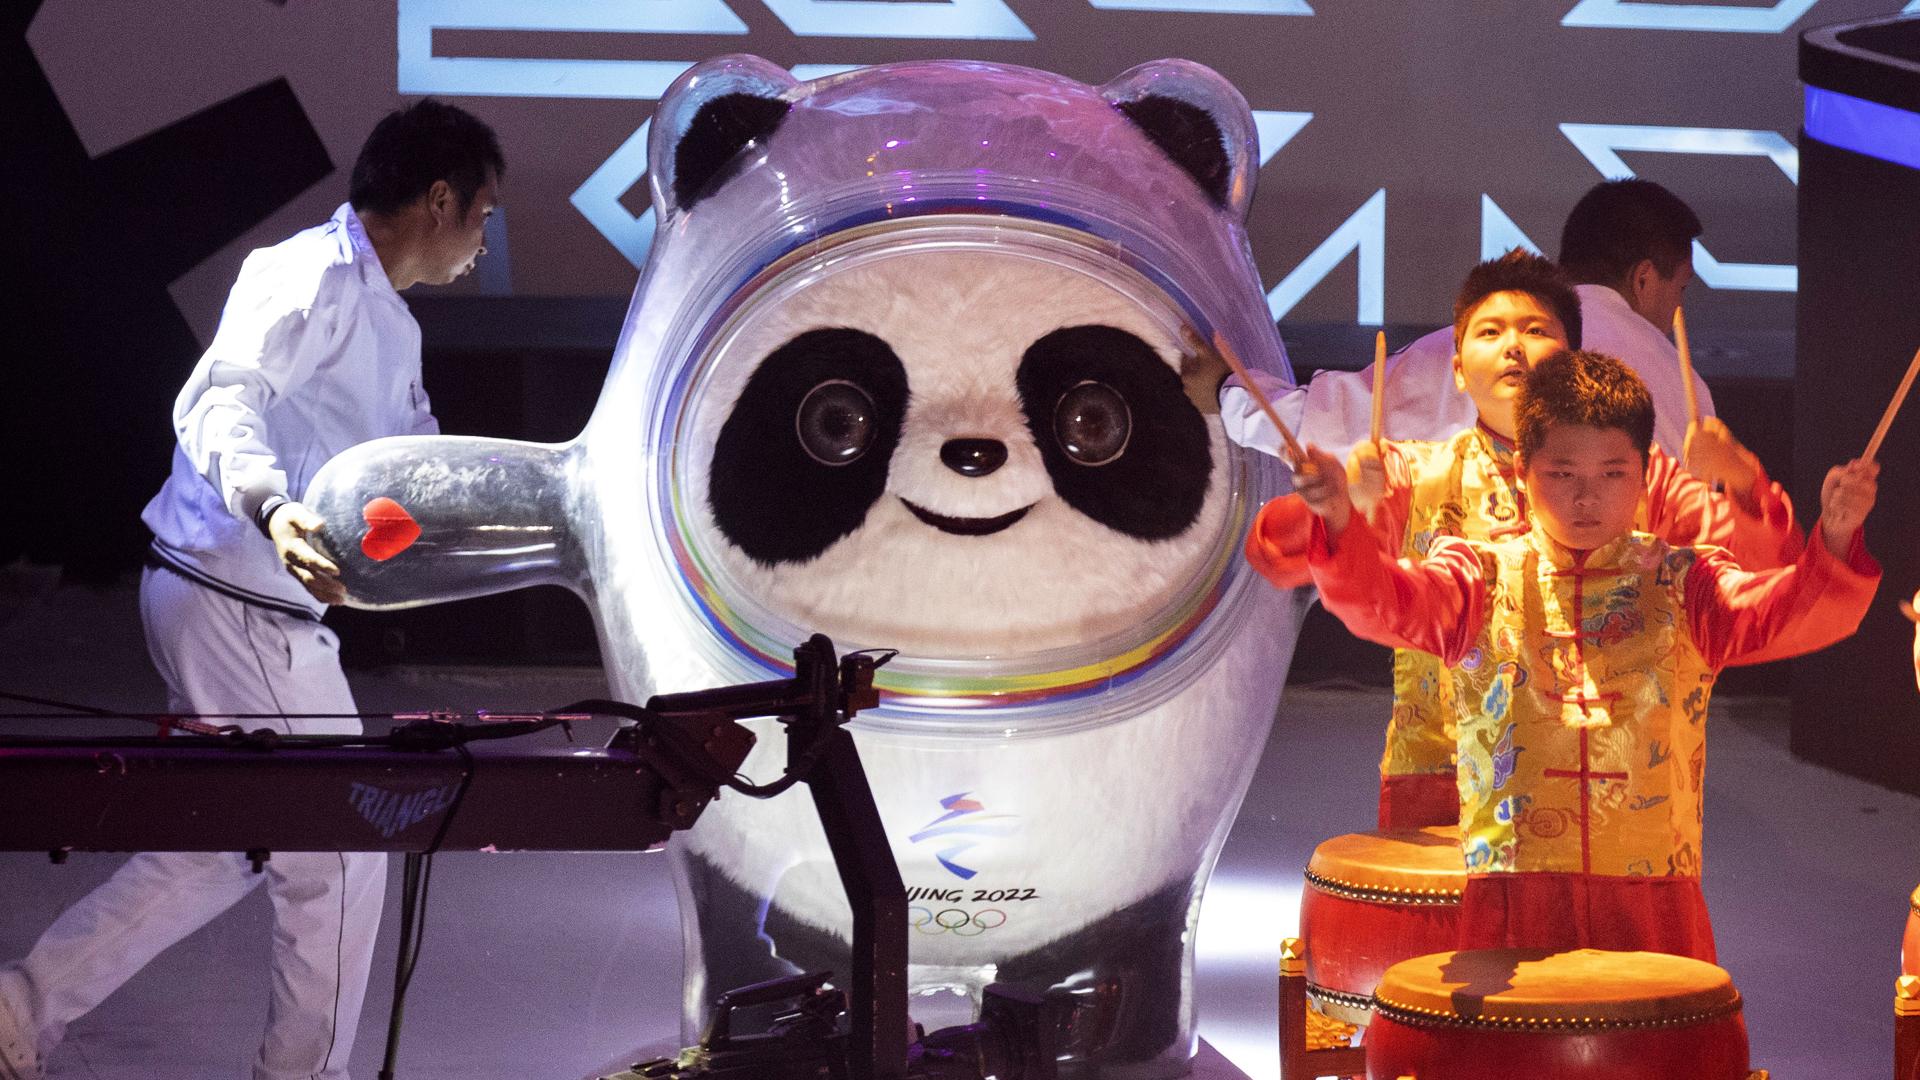 Conoce a Bing Dwen Dwen, la mascota de las Olimpiadas de Invierno 2022